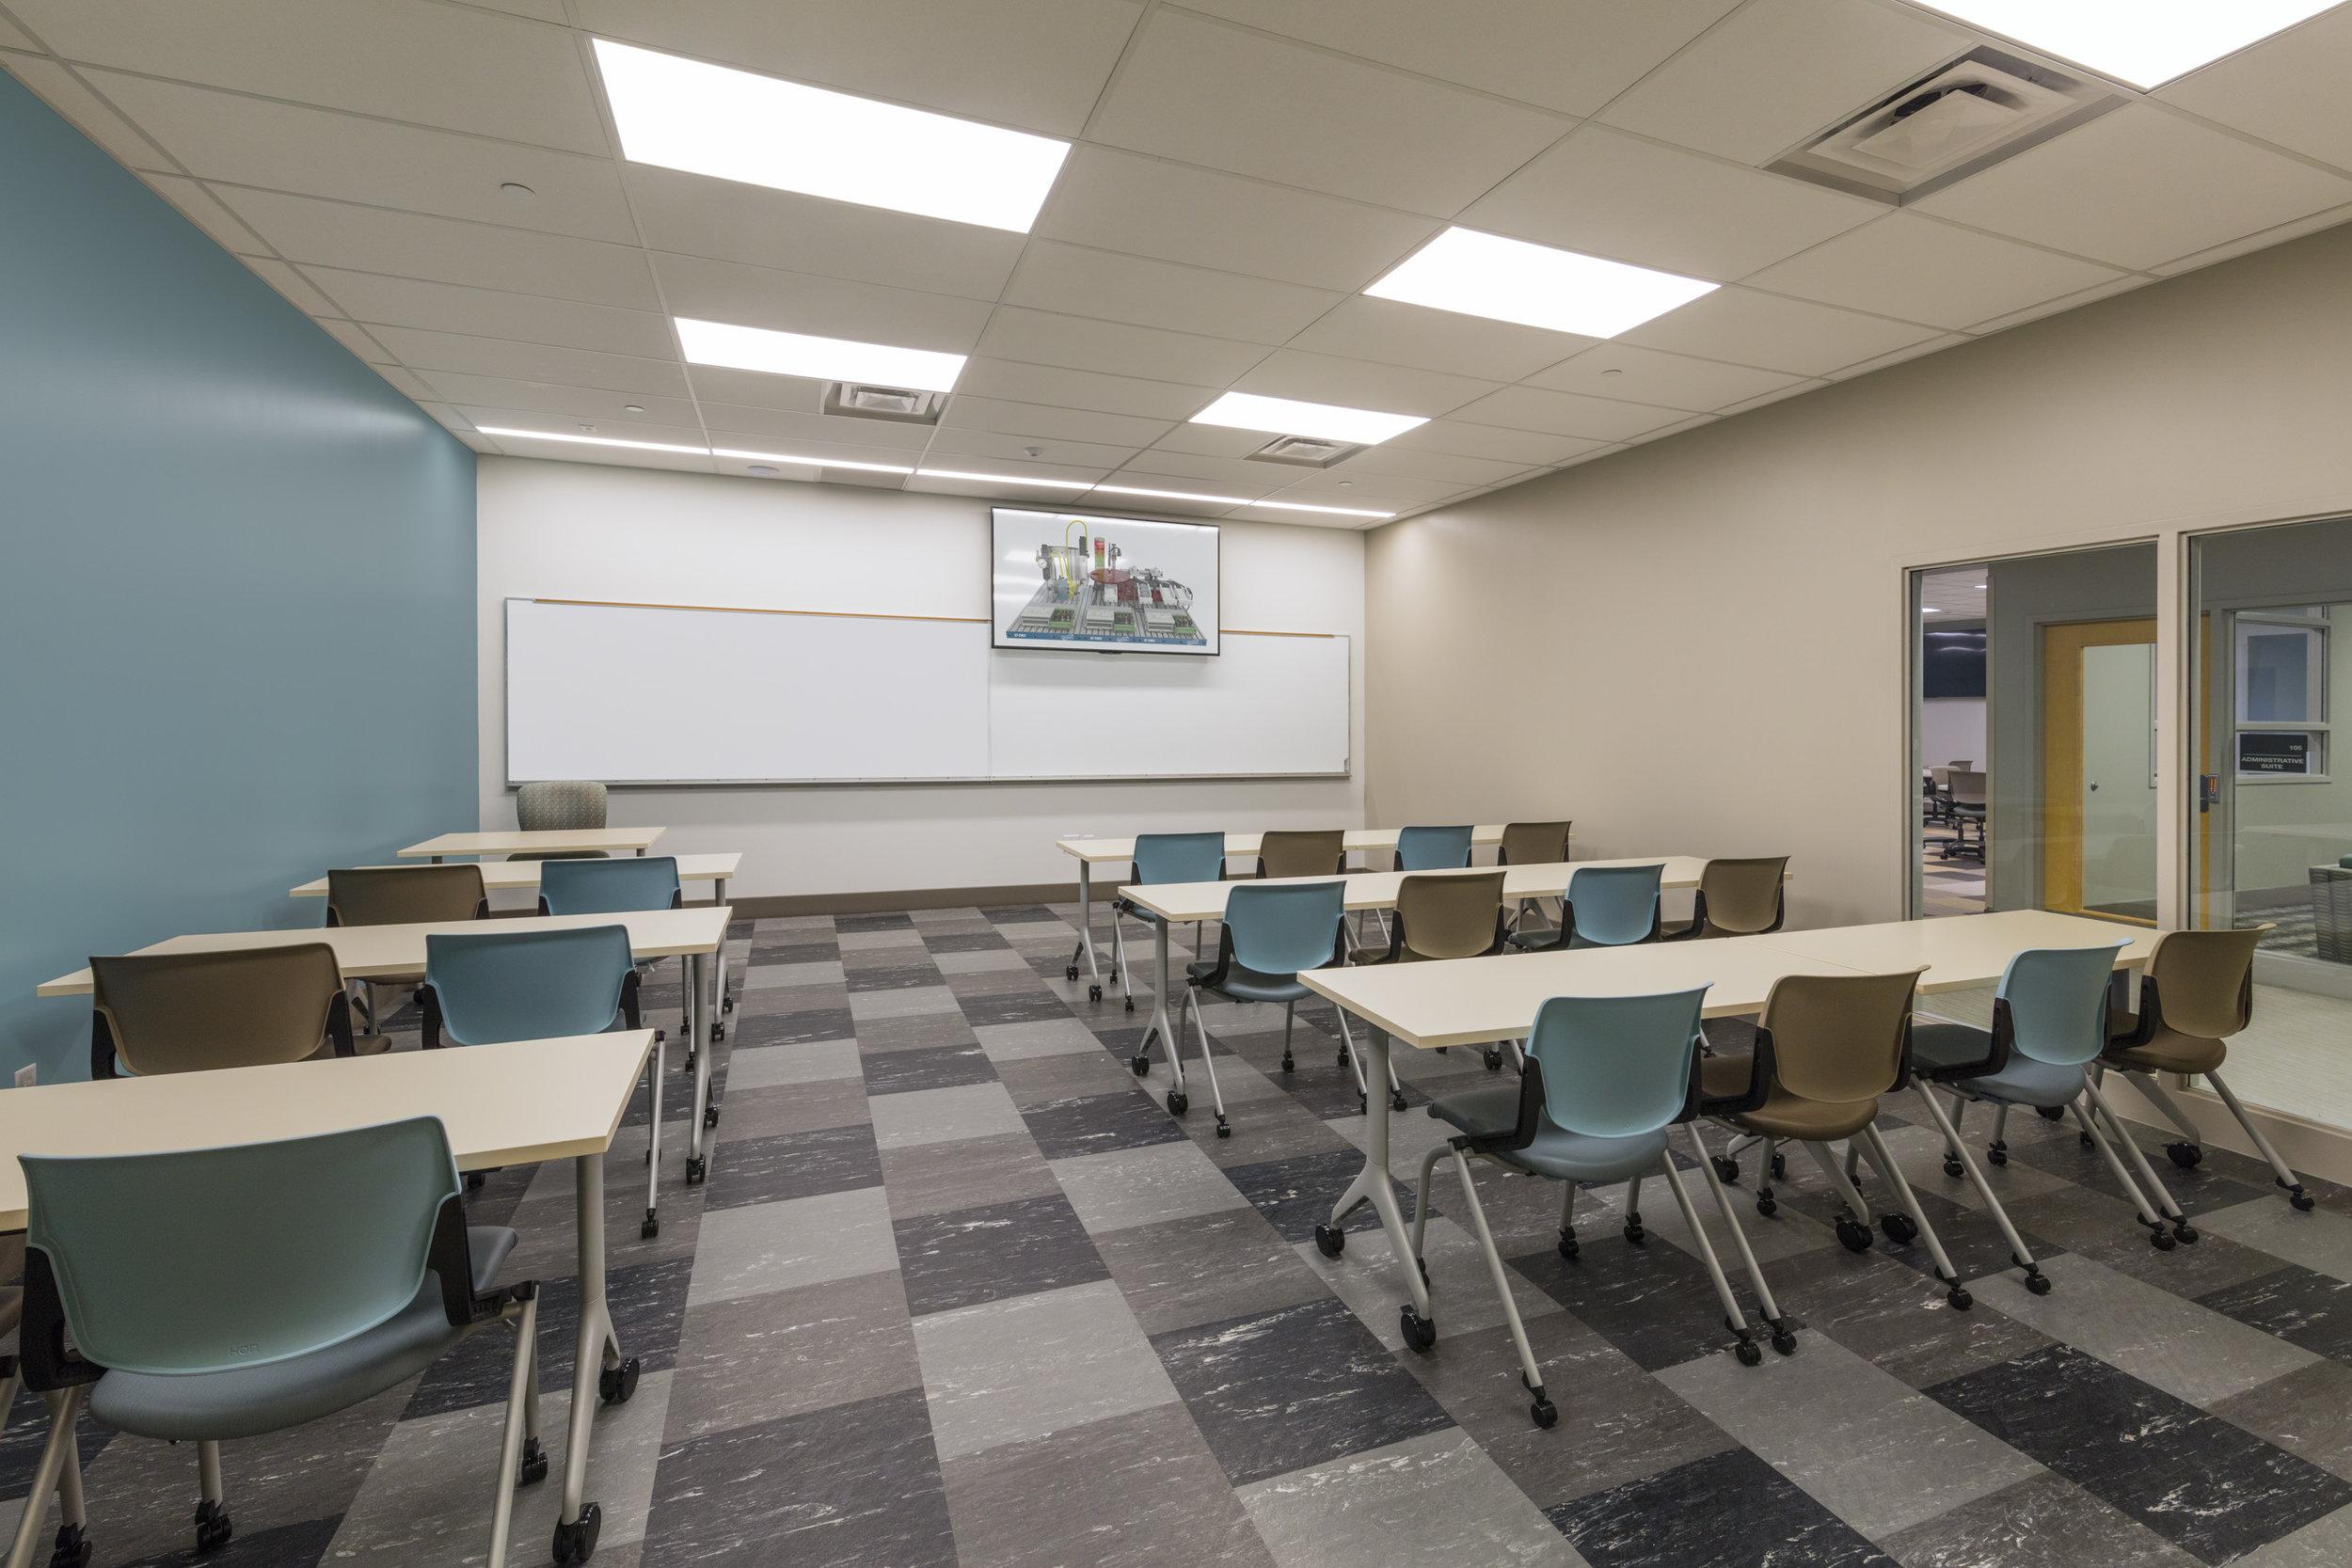 FLC Interior Classroom.jpg